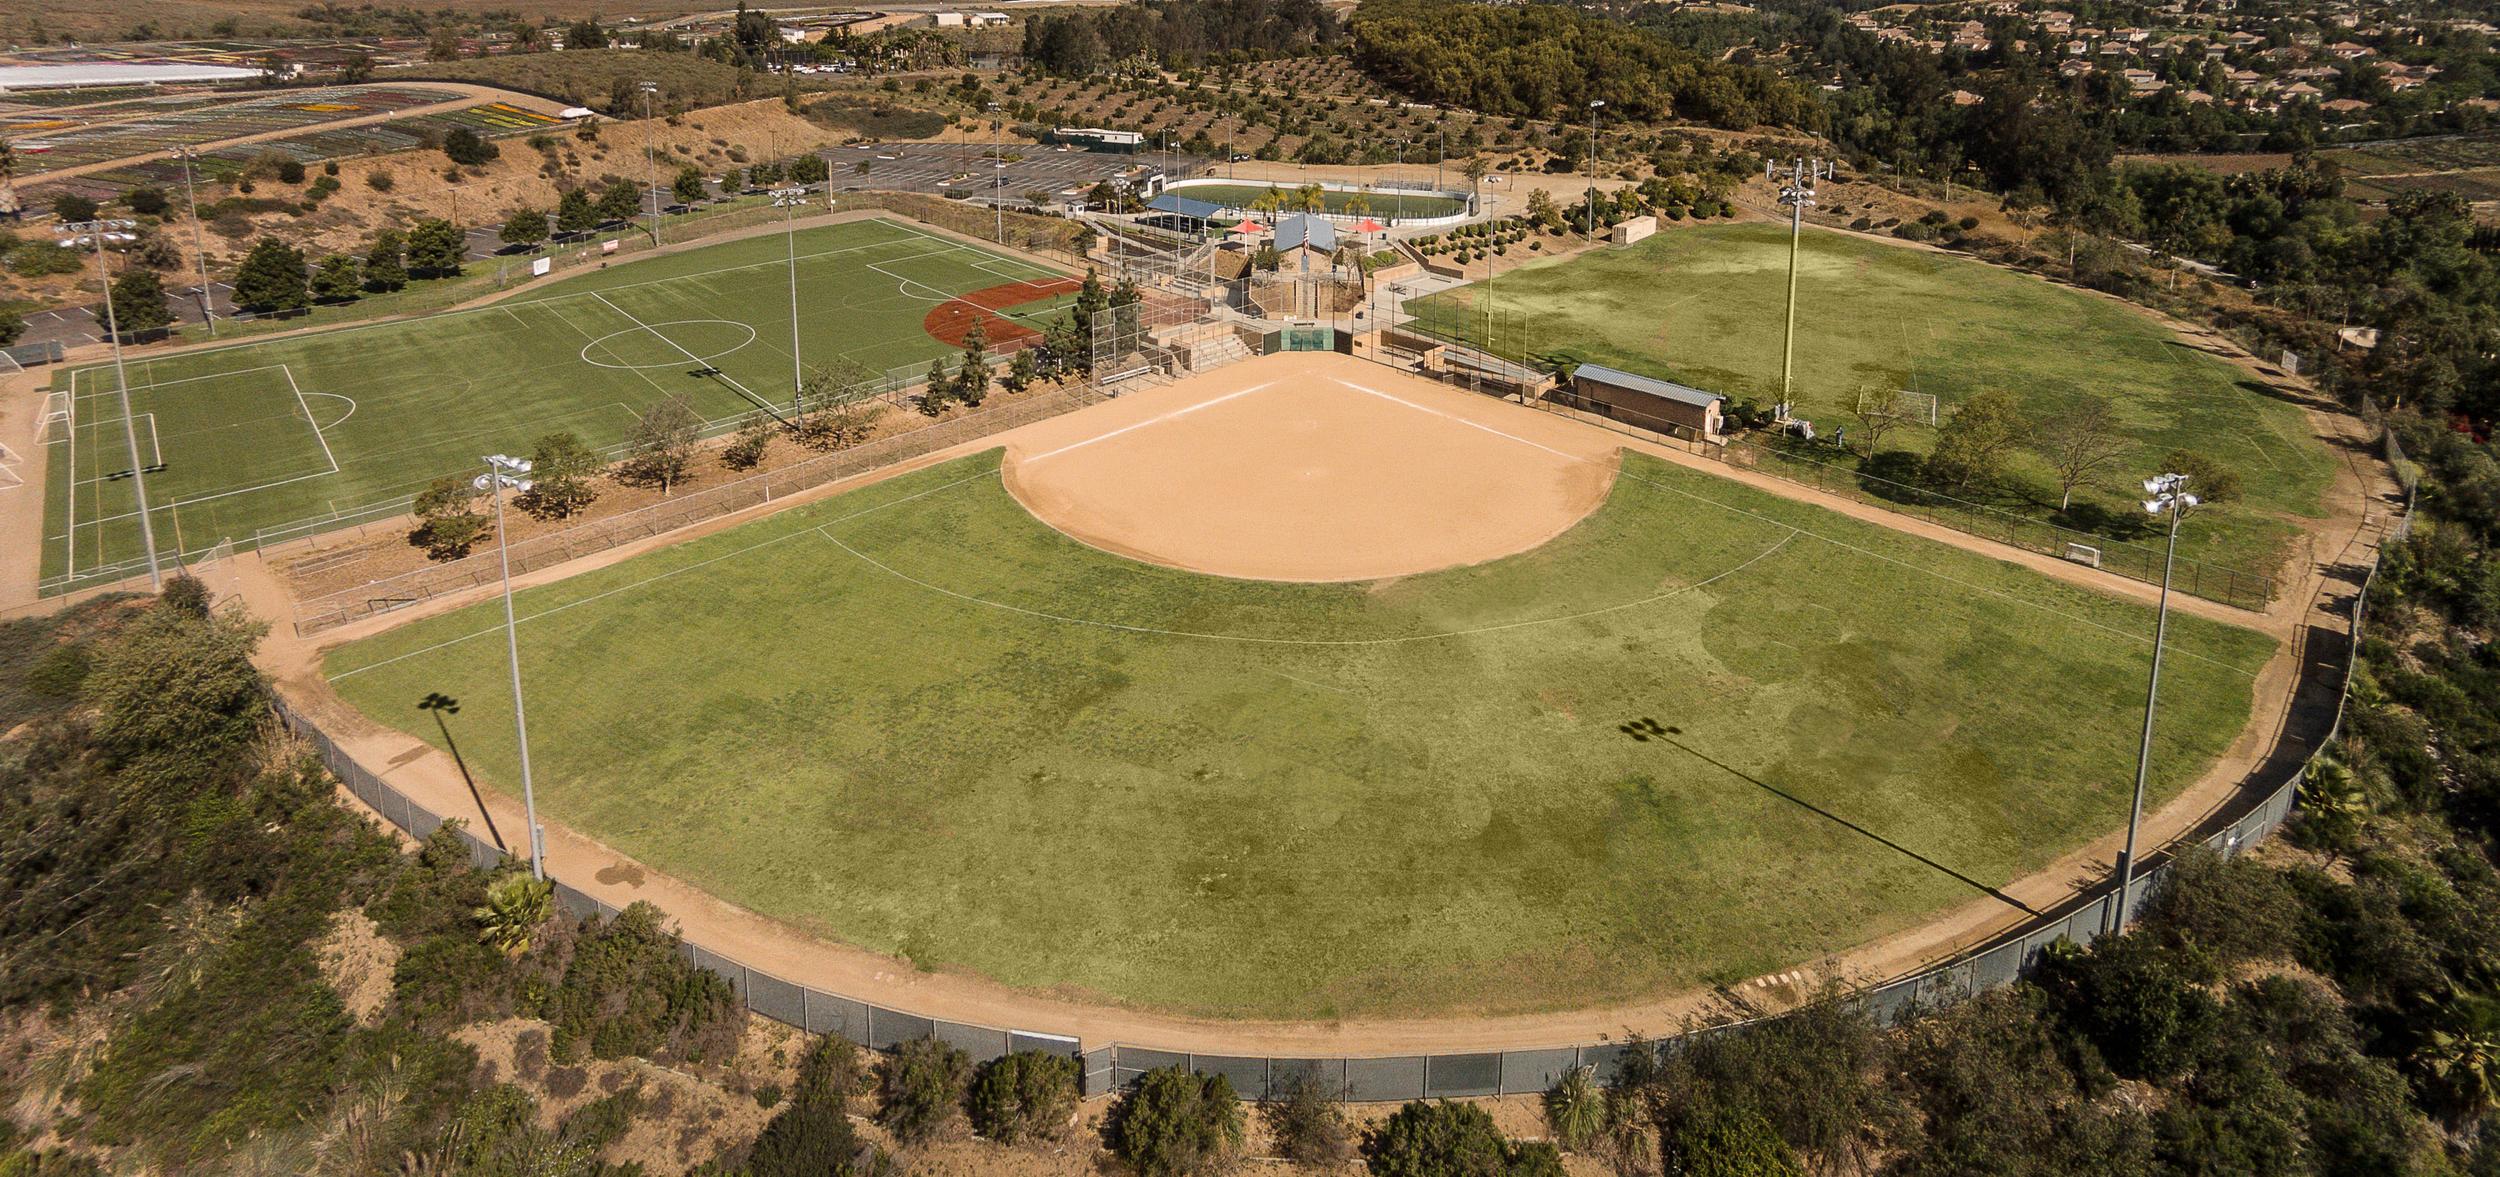 Ingold Sports Park 3000pxls-17.jpg